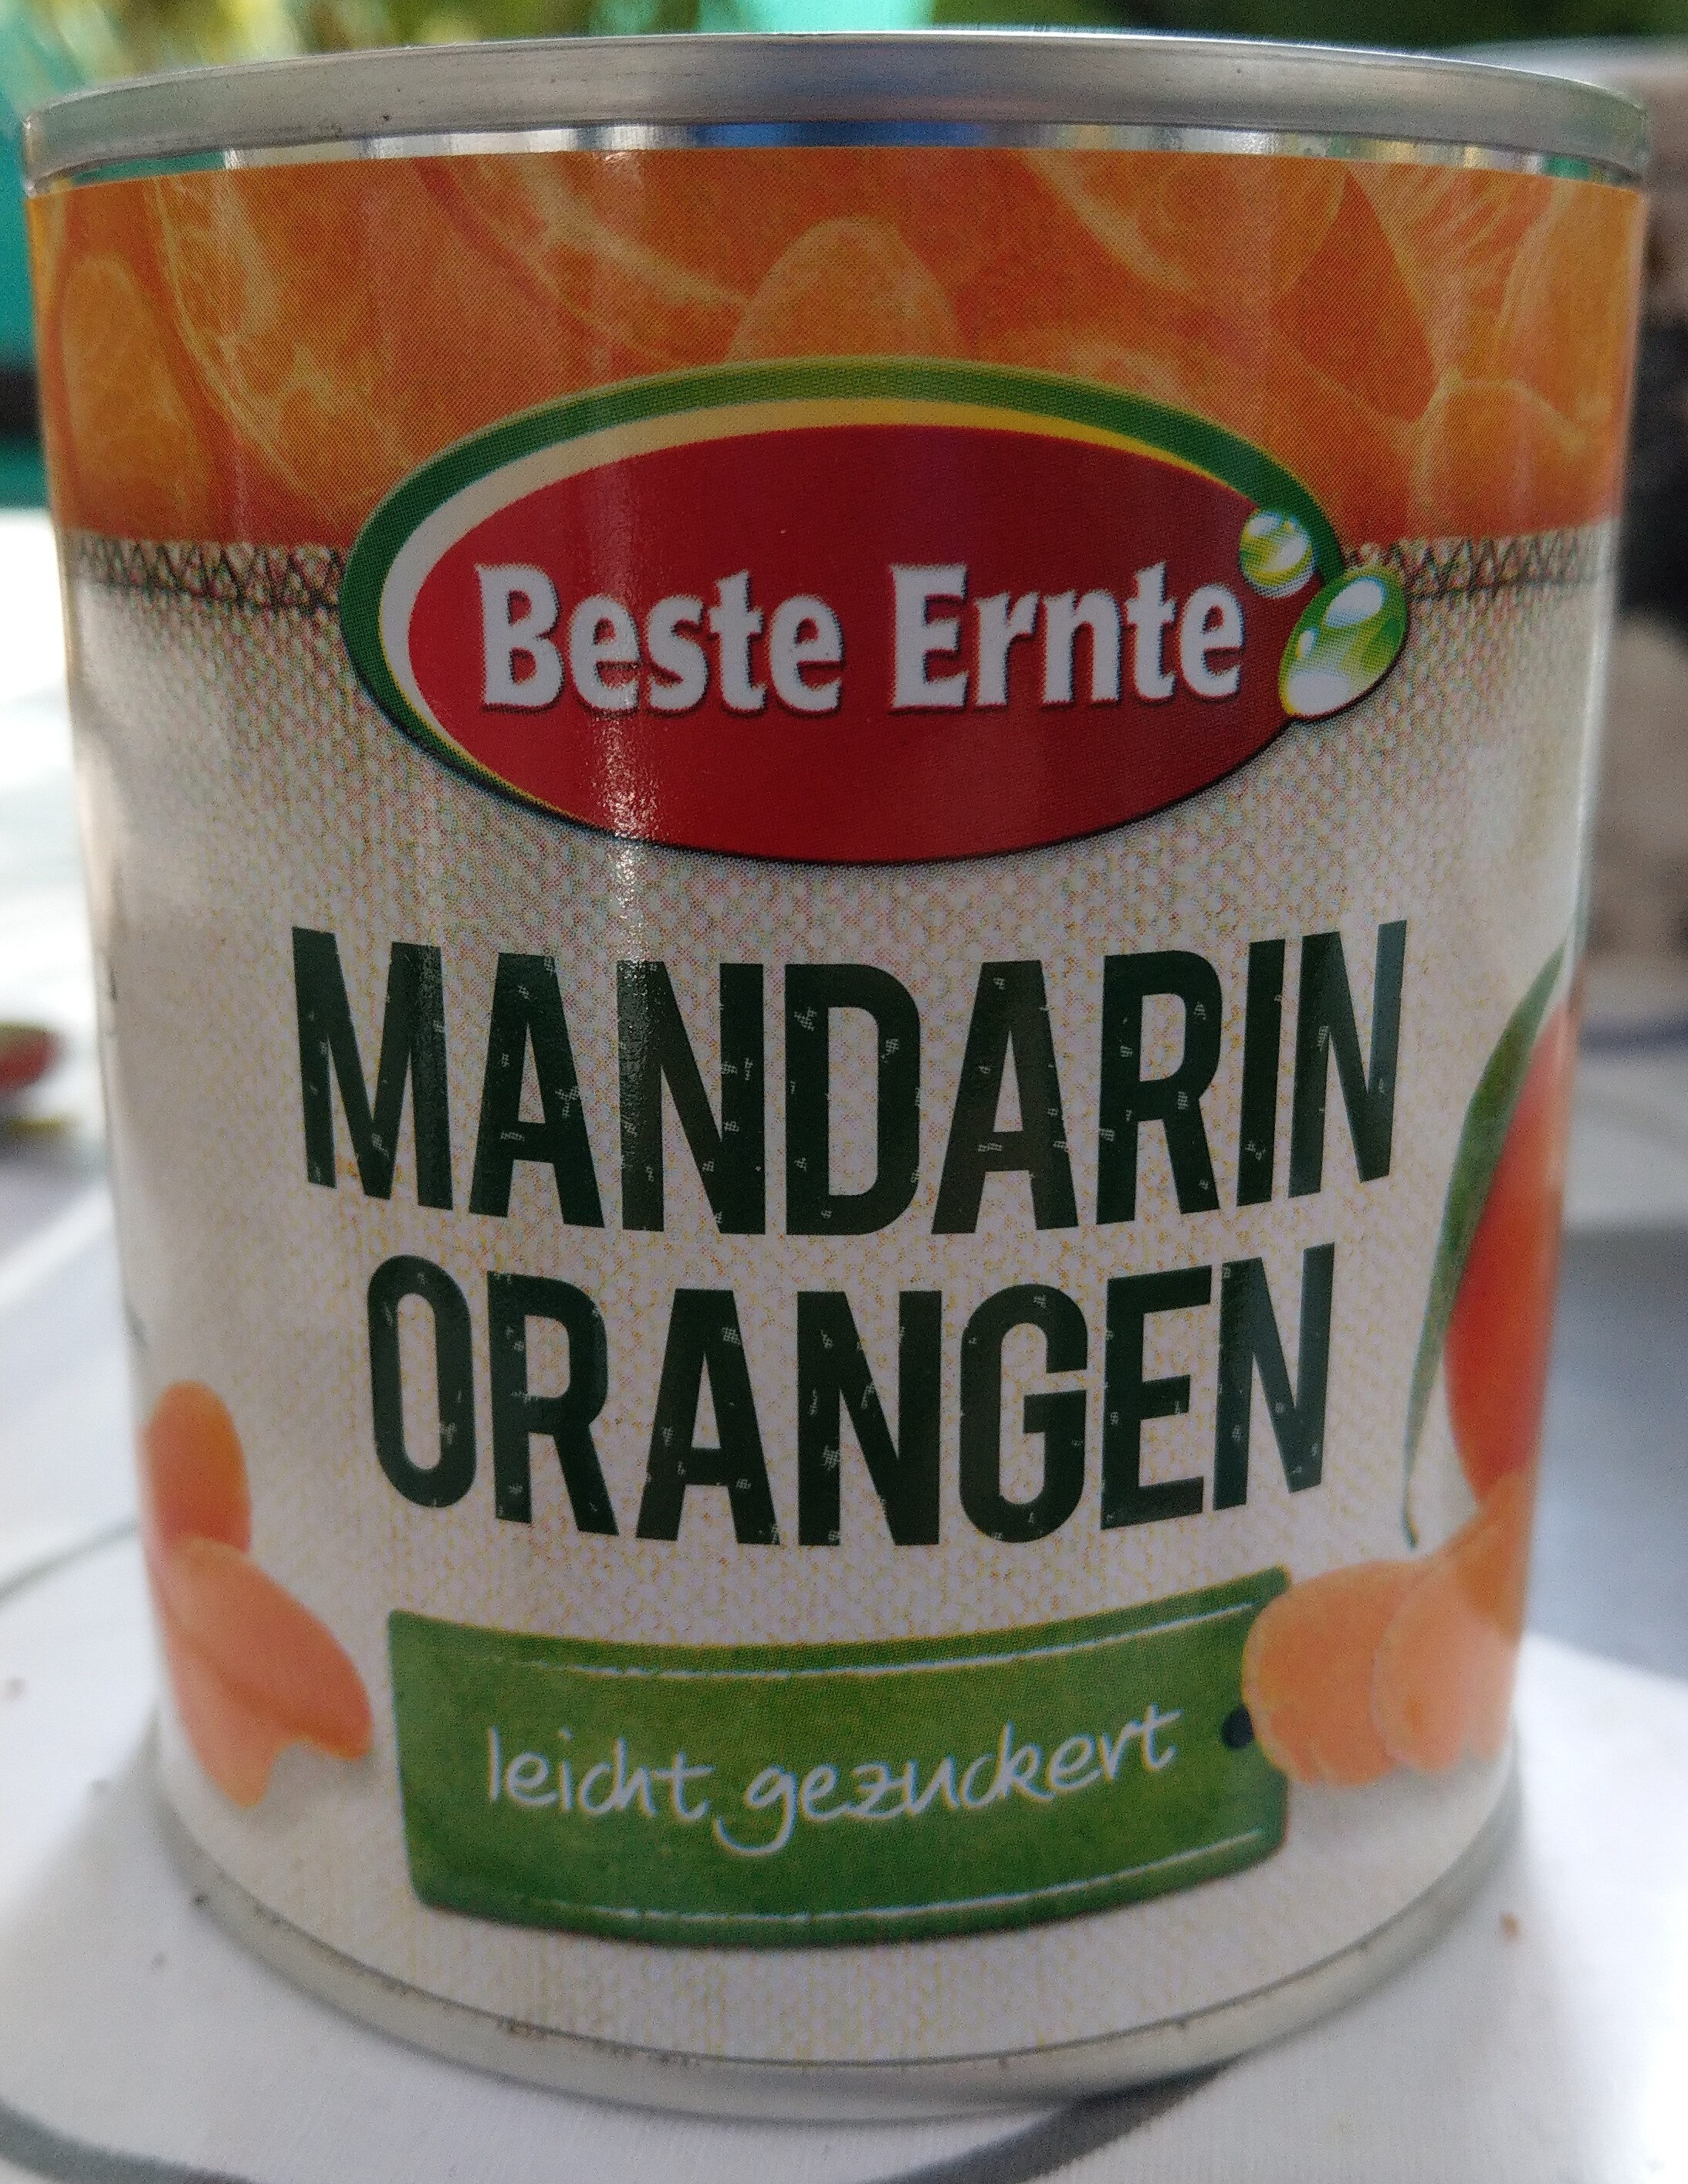 Mandarinen Orangen - Product